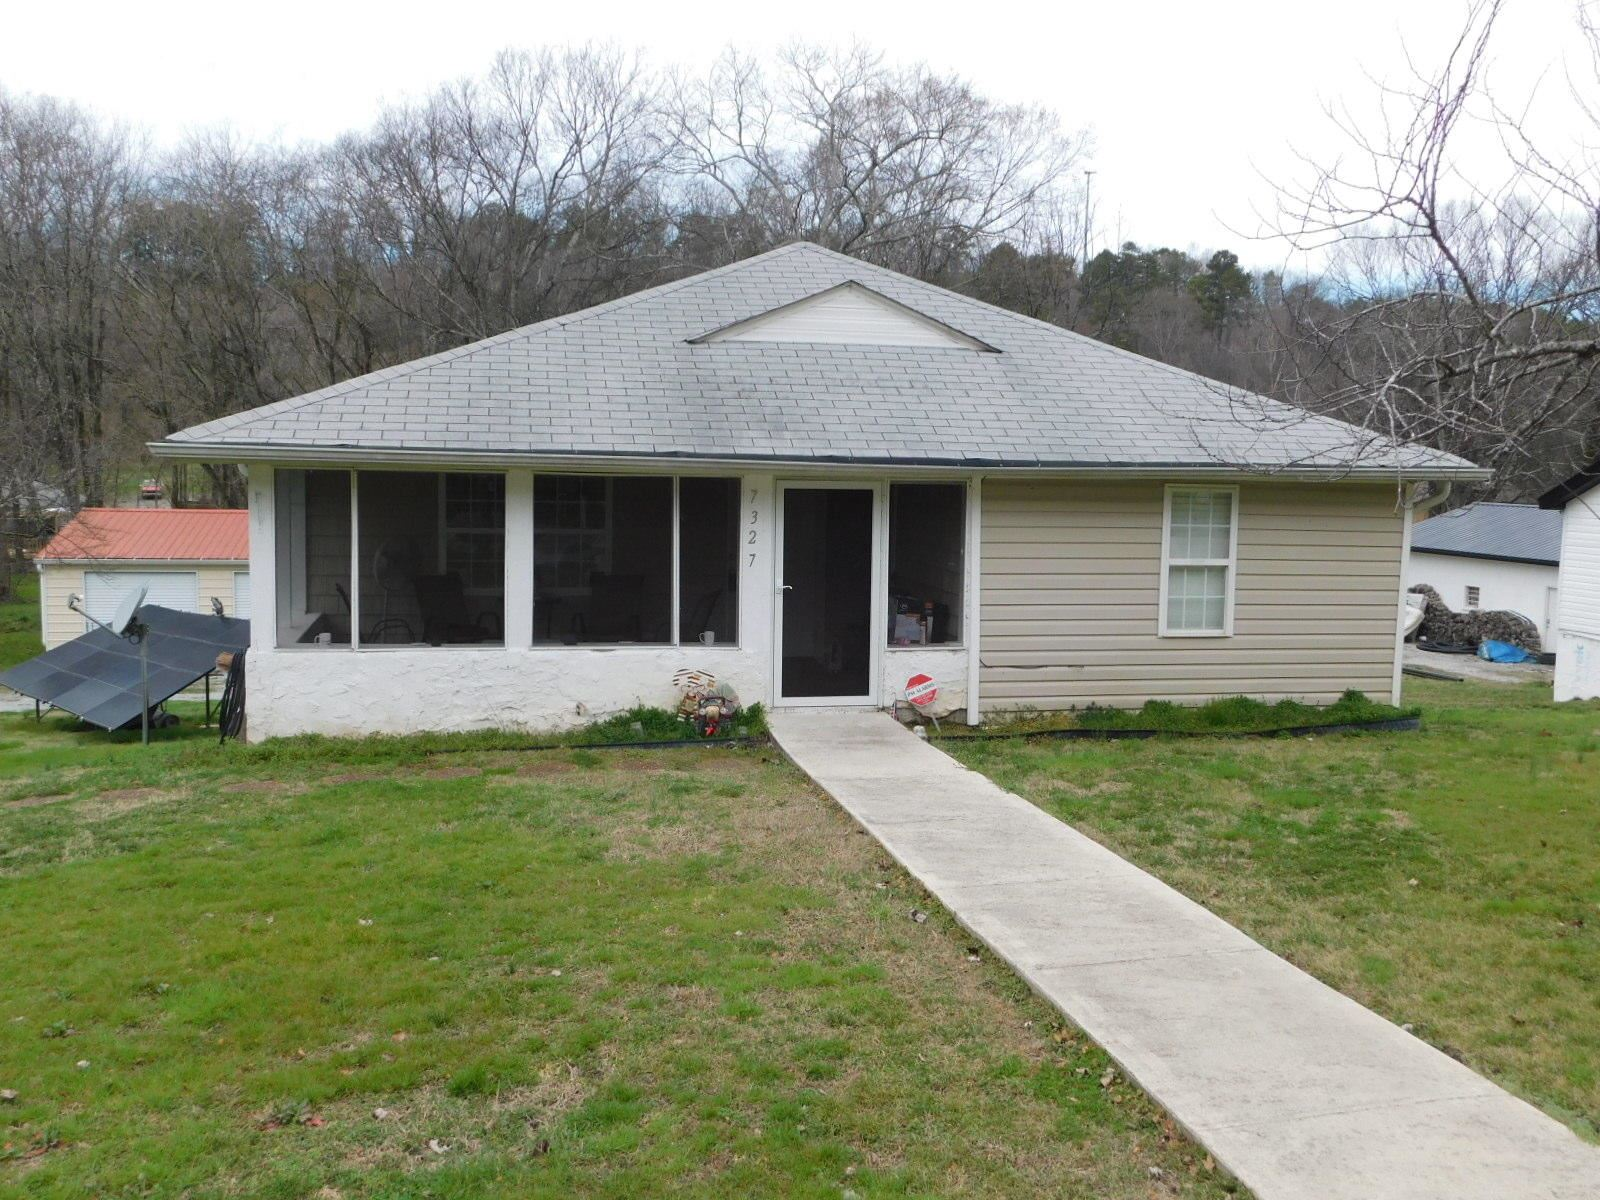 7327 Moses Rd, Hixson, TN 37343 - MLS#: 1331848